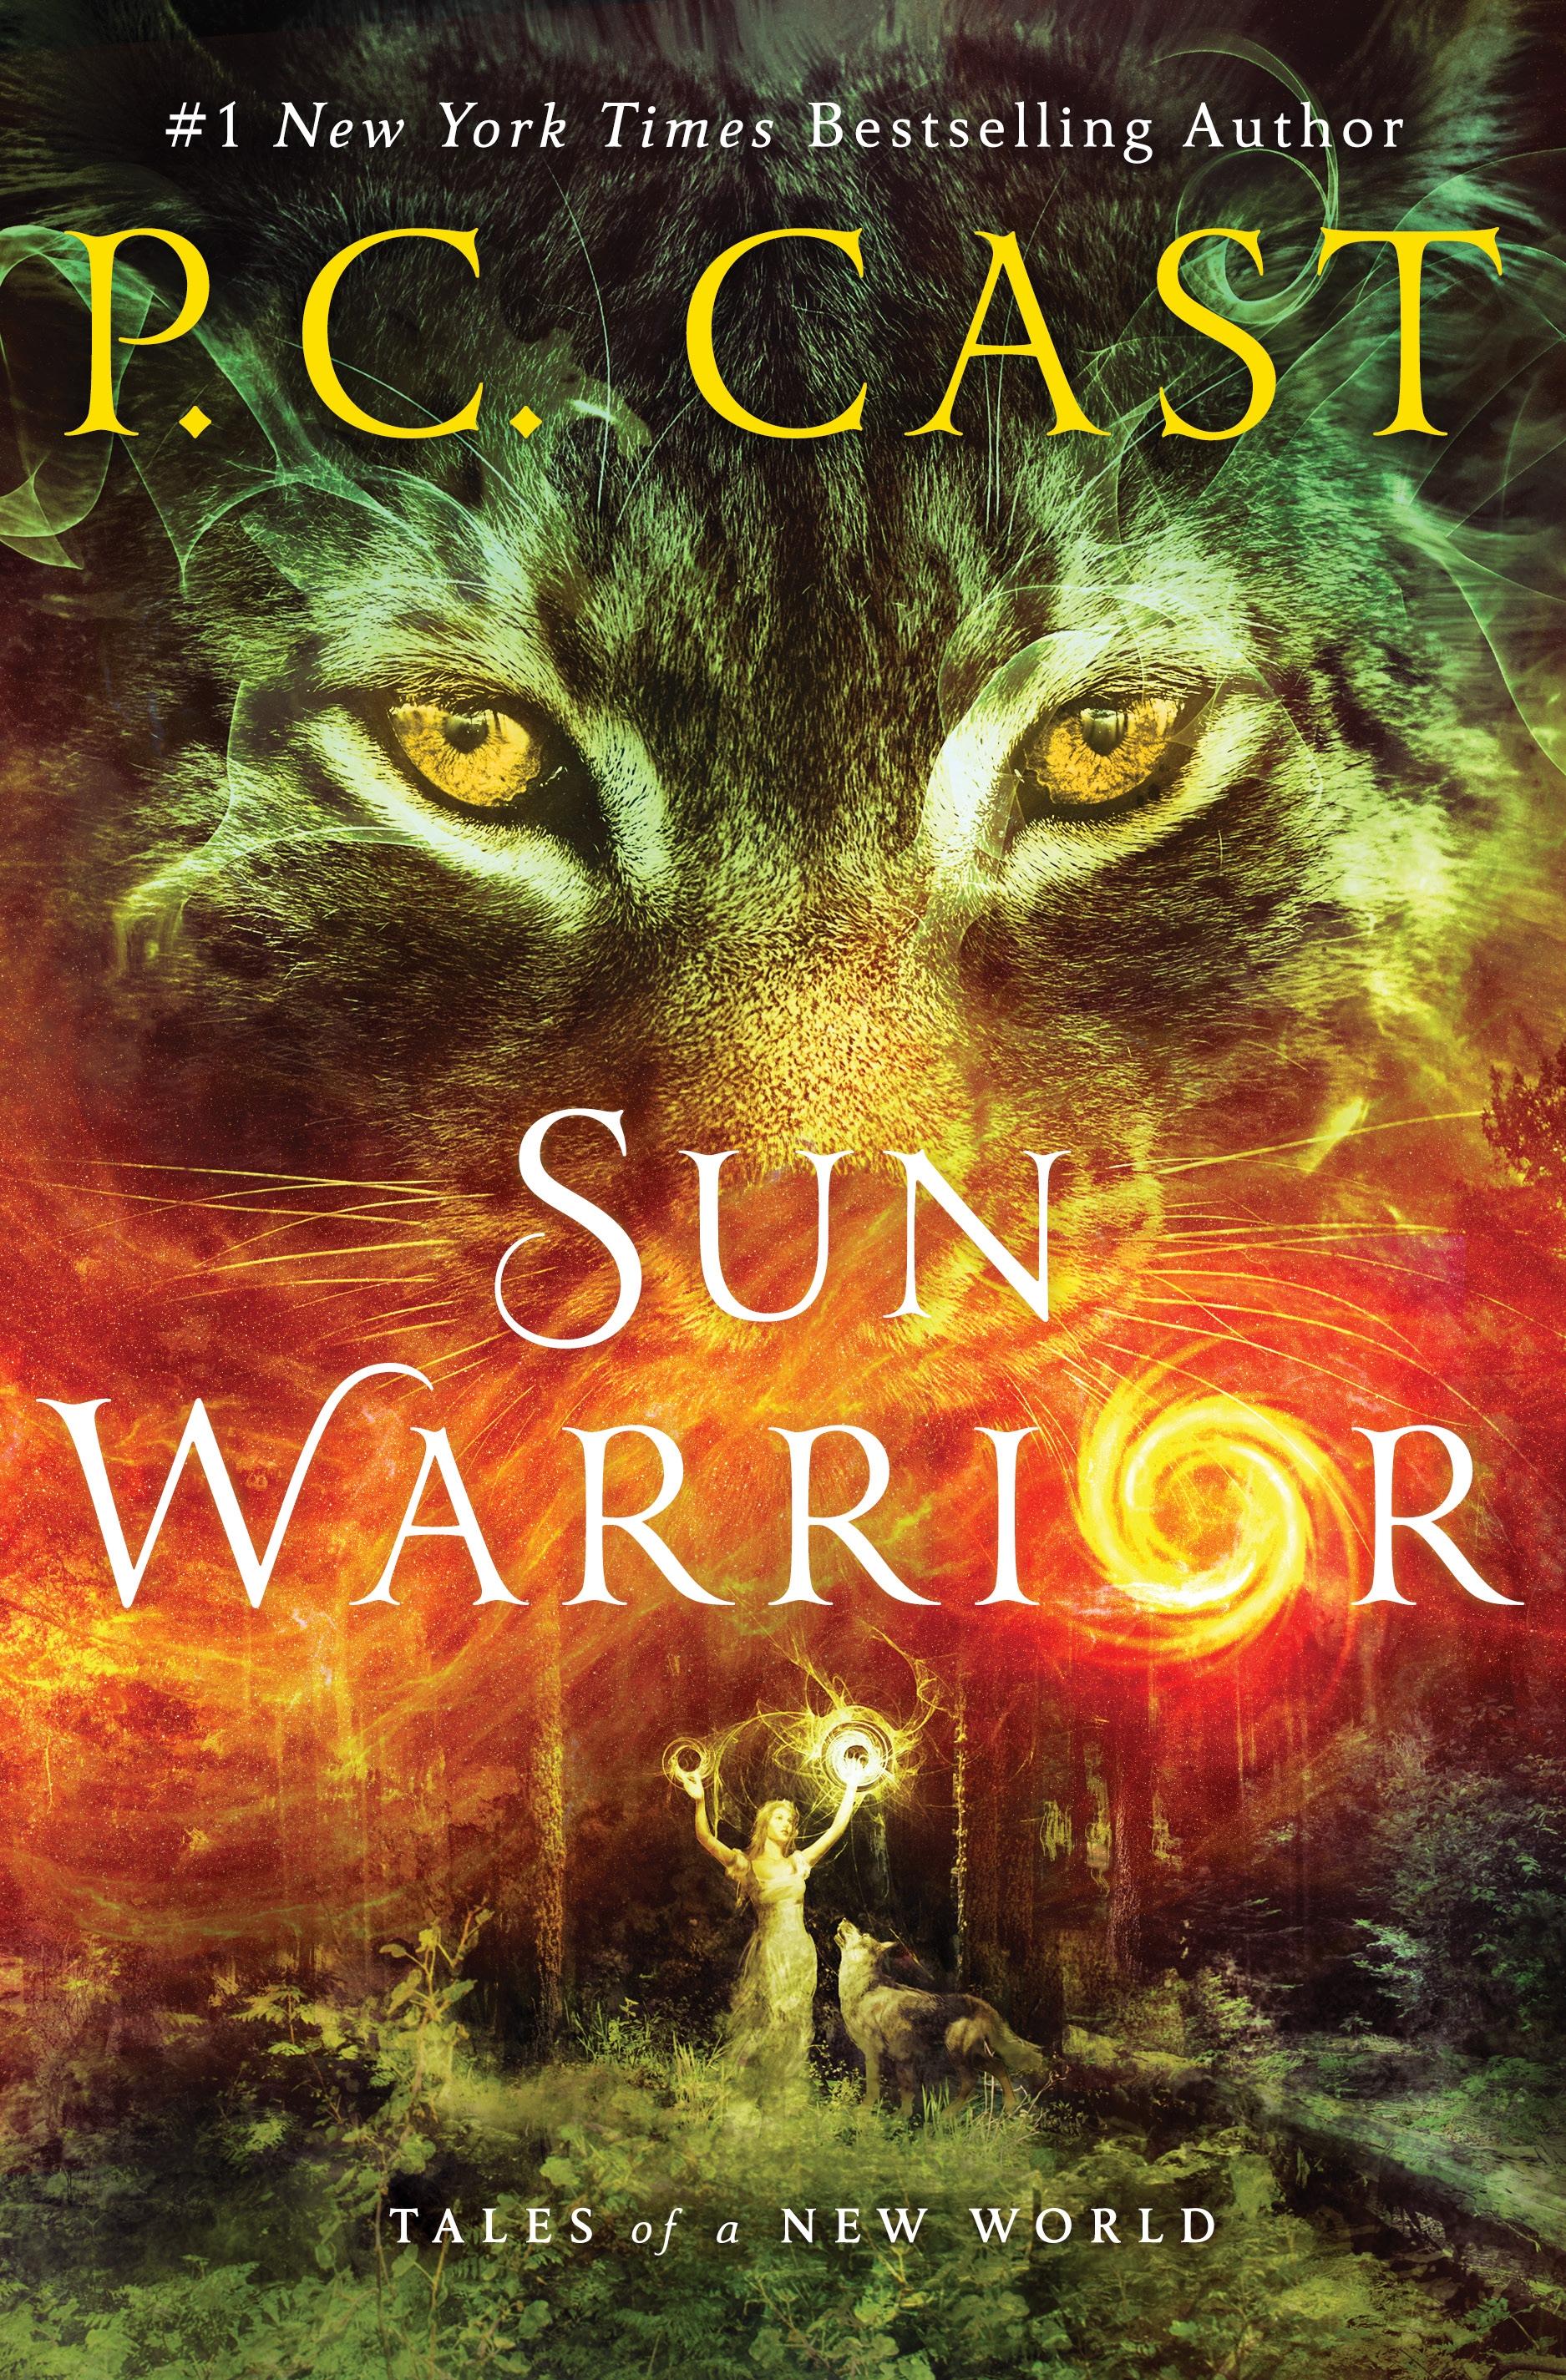 Sun Warrior Tales of a New World